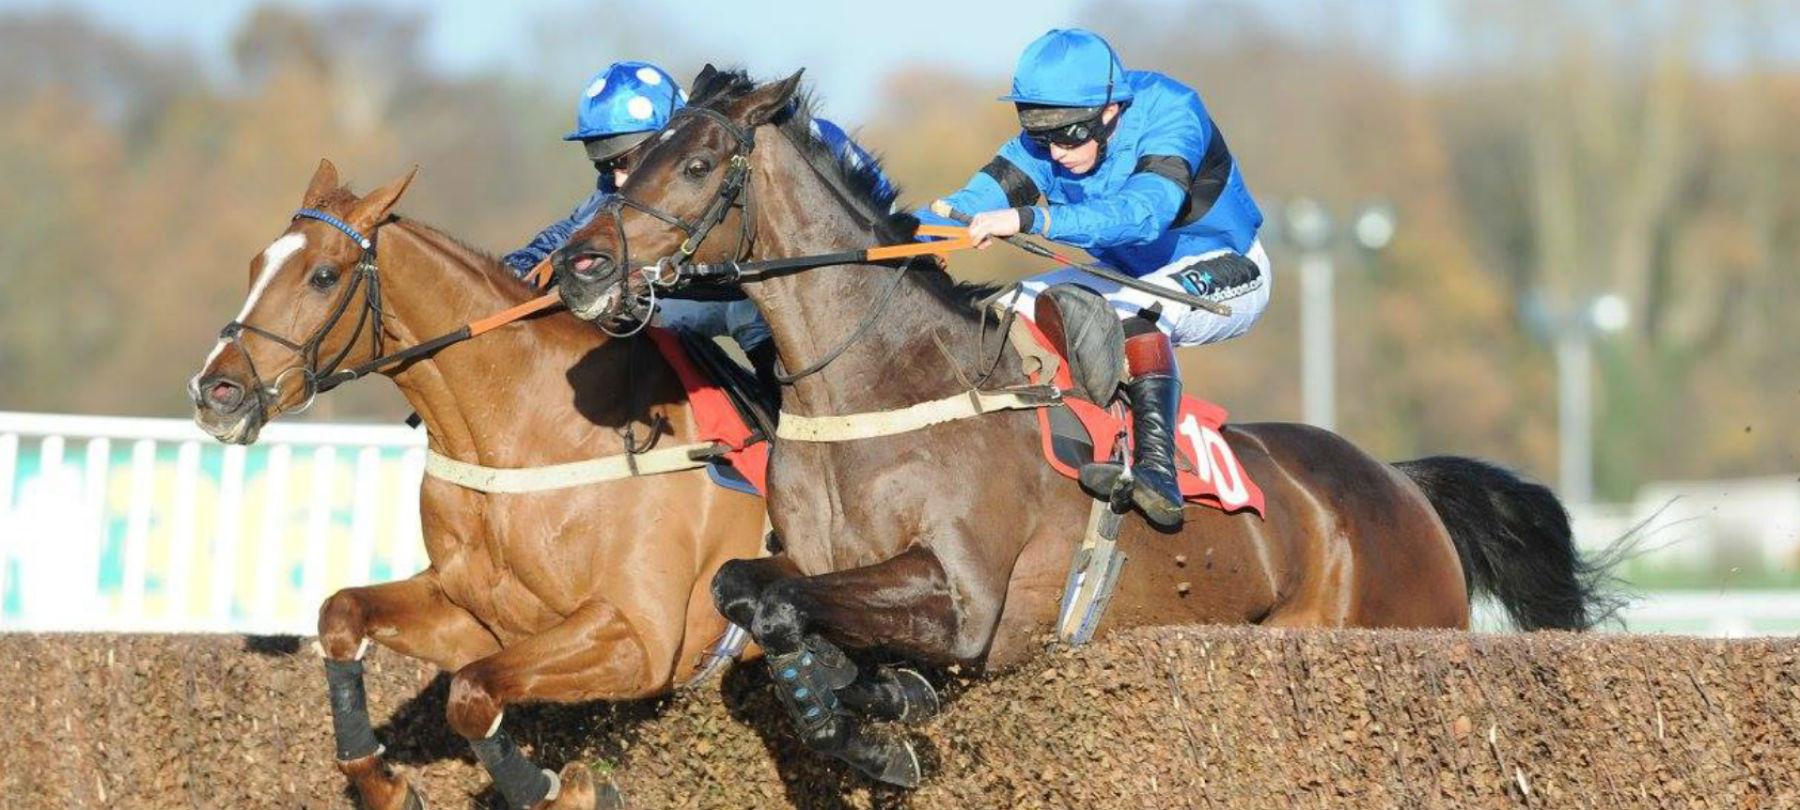 Copy of two-horses-jumping-hero.jpg